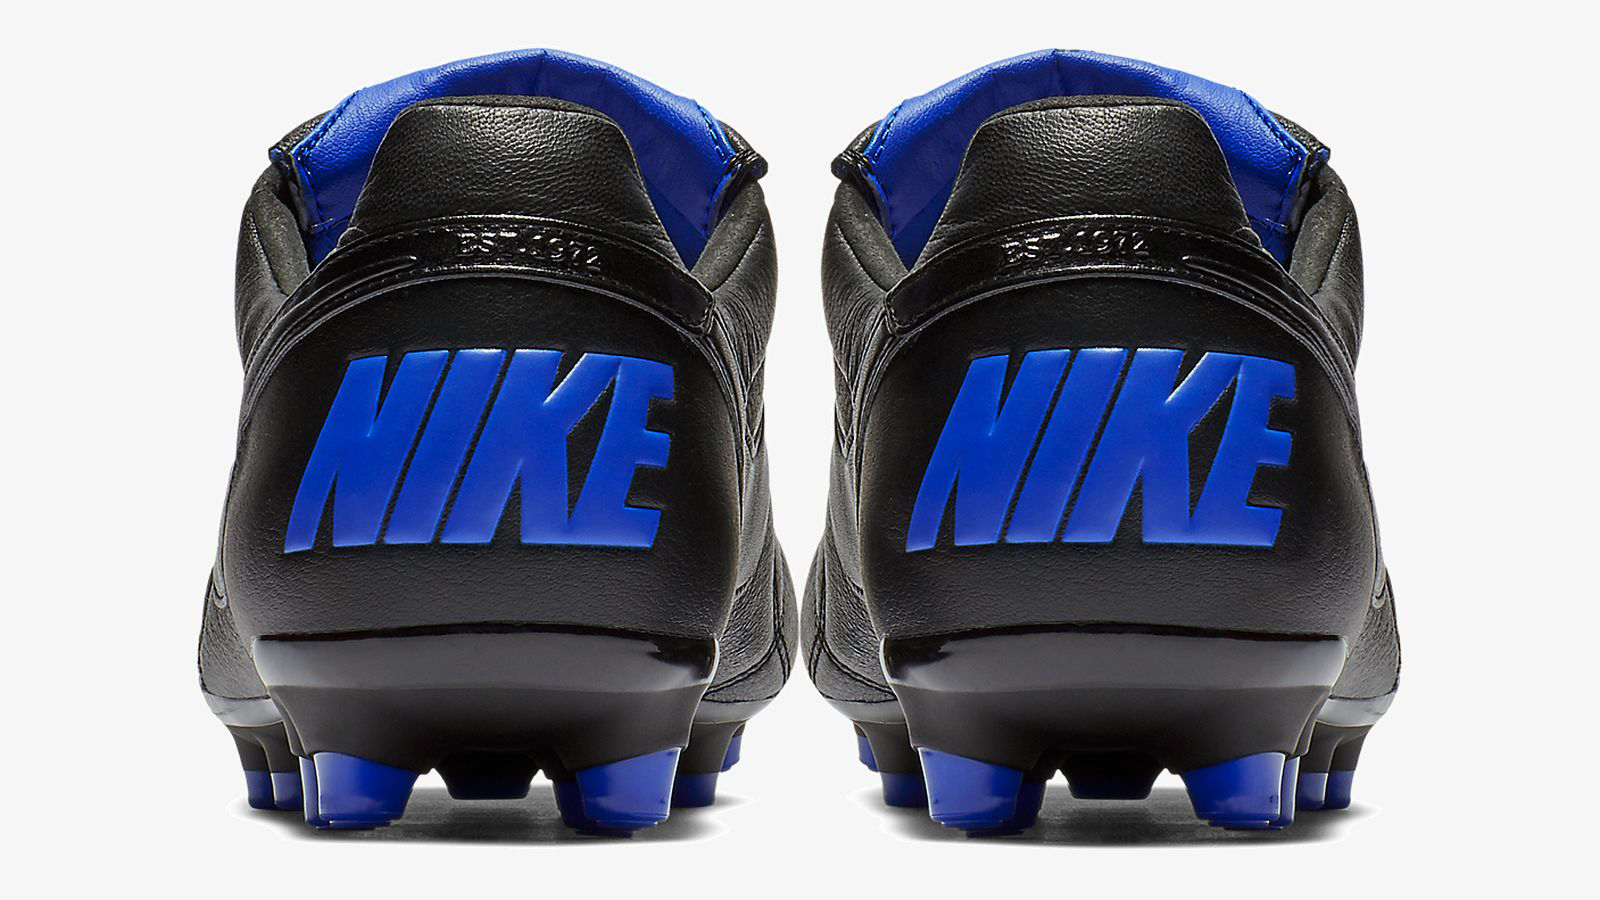 black-racer-blue-nike-premier-ii-boots-8